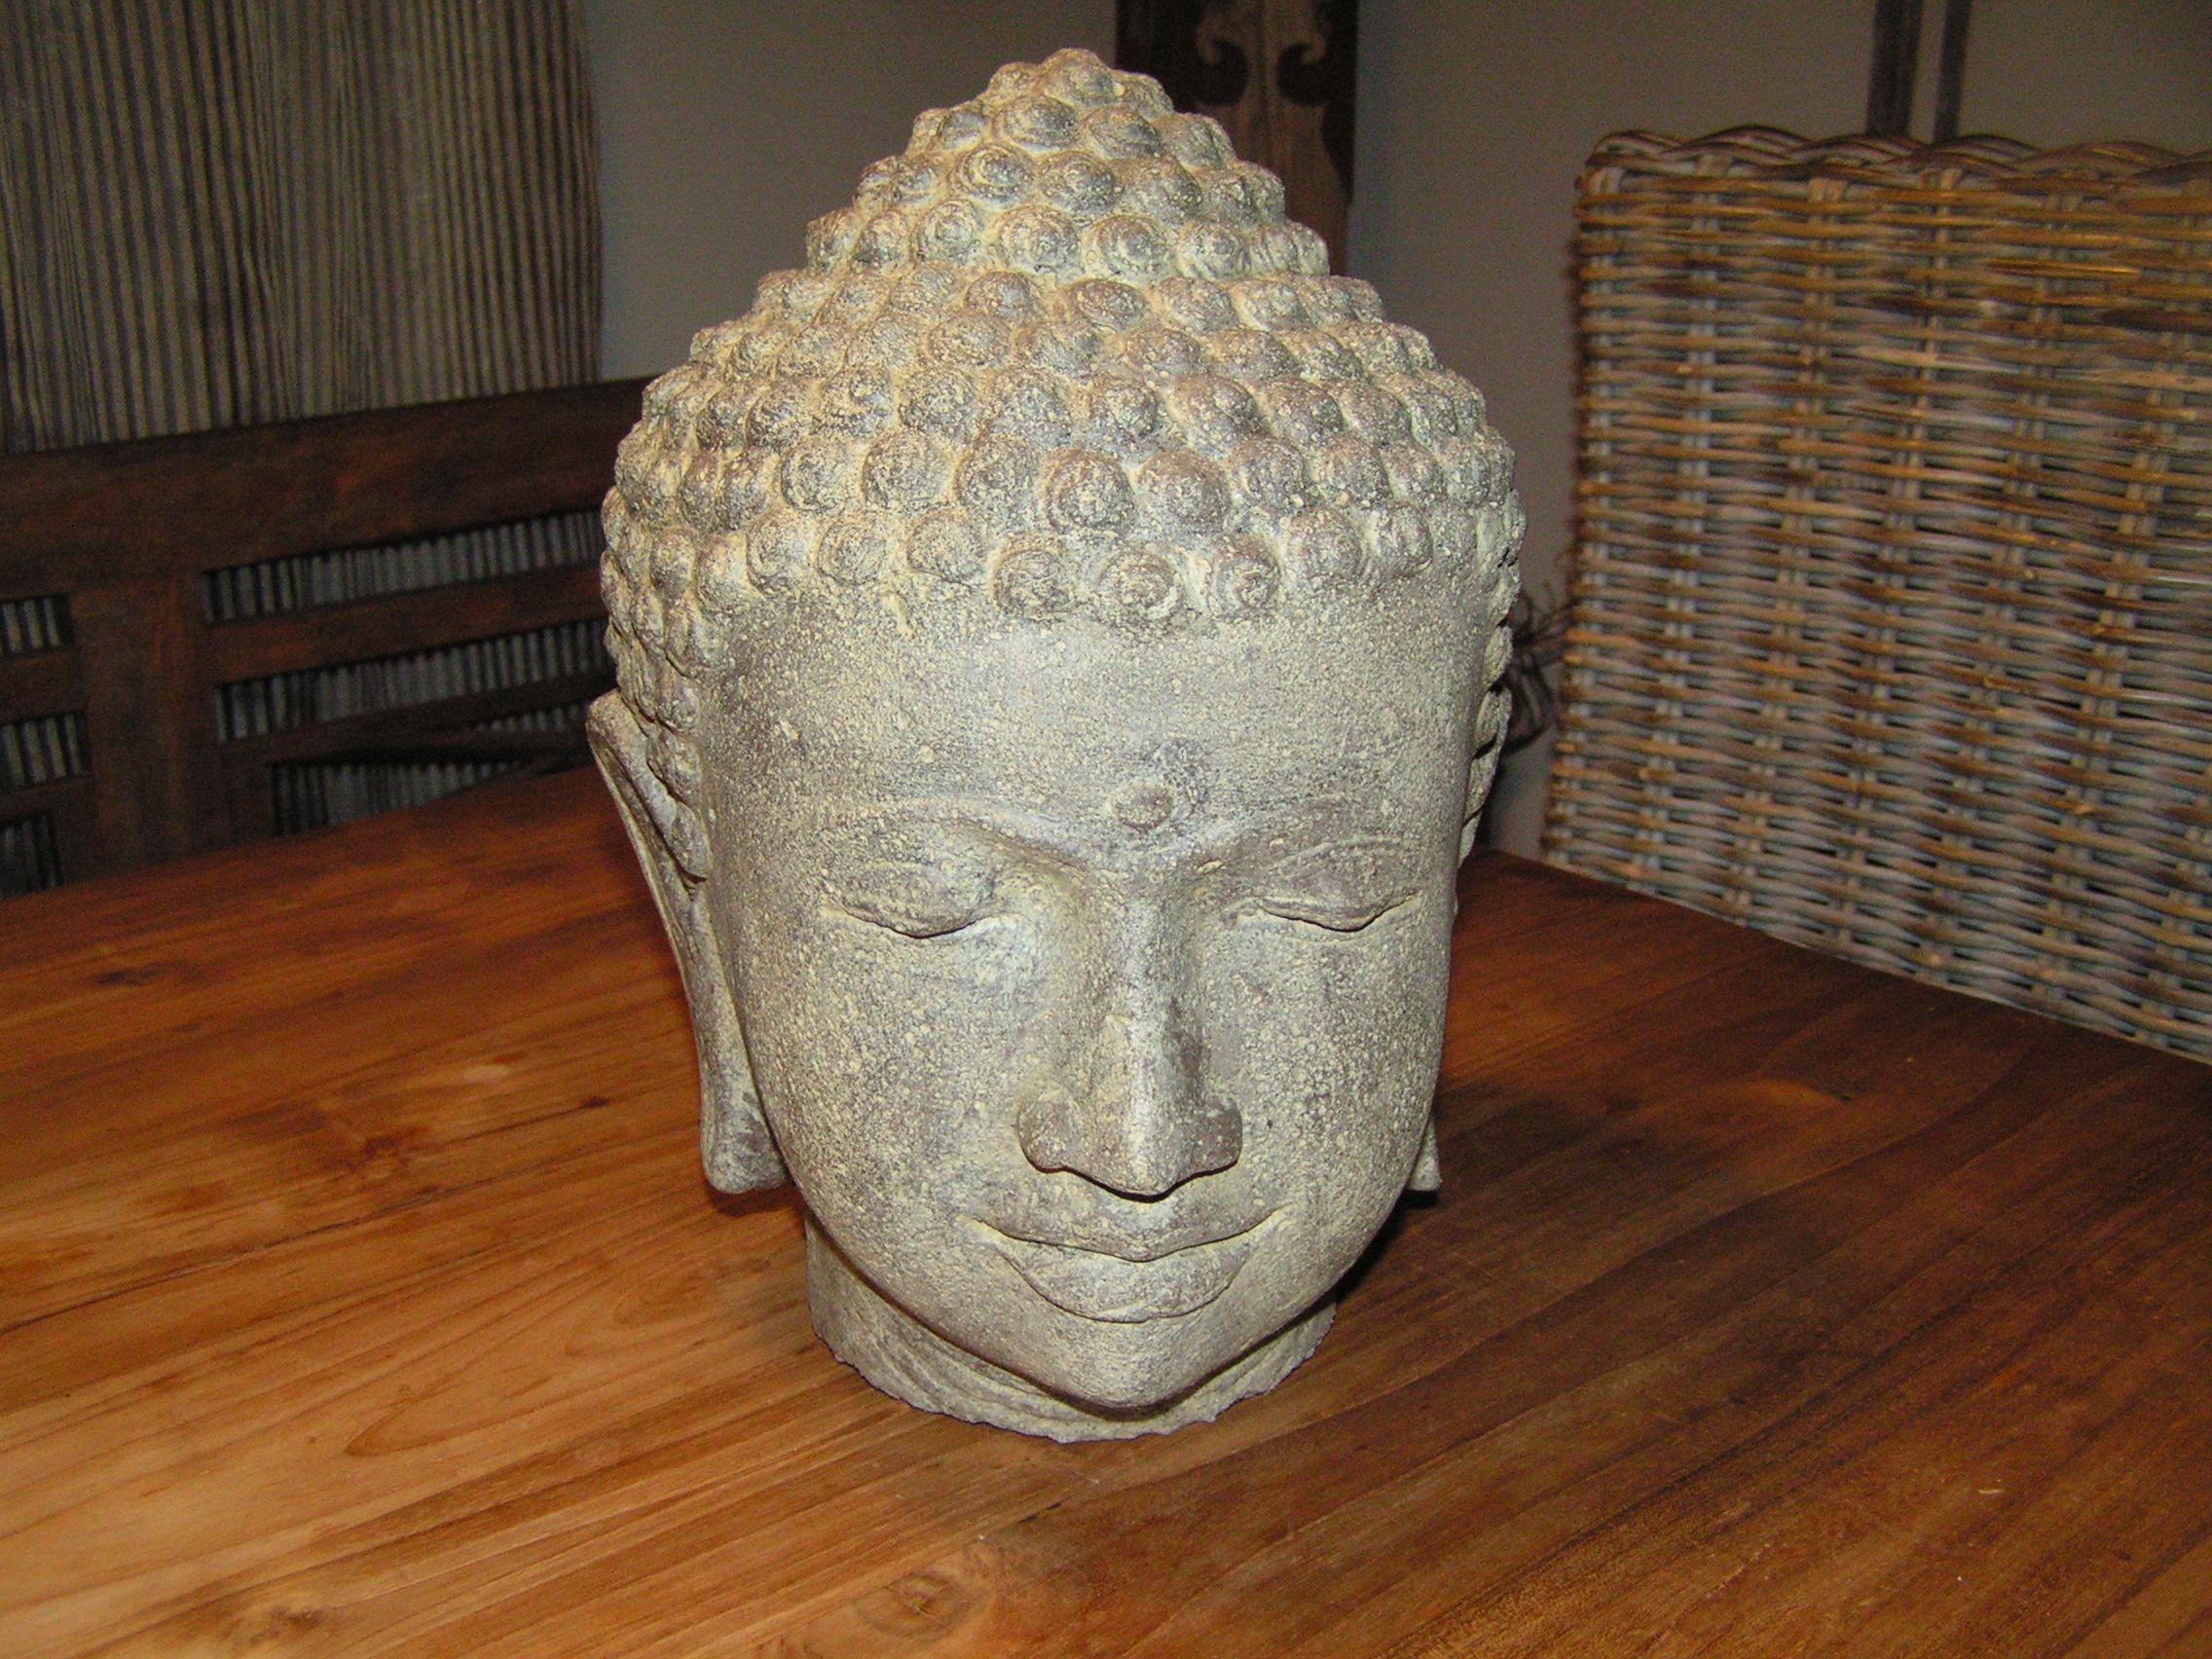 buddha kopf steinguss 50cm h he leicht hohlguss antikfinish gartendekoration hauner. Black Bedroom Furniture Sets. Home Design Ideas